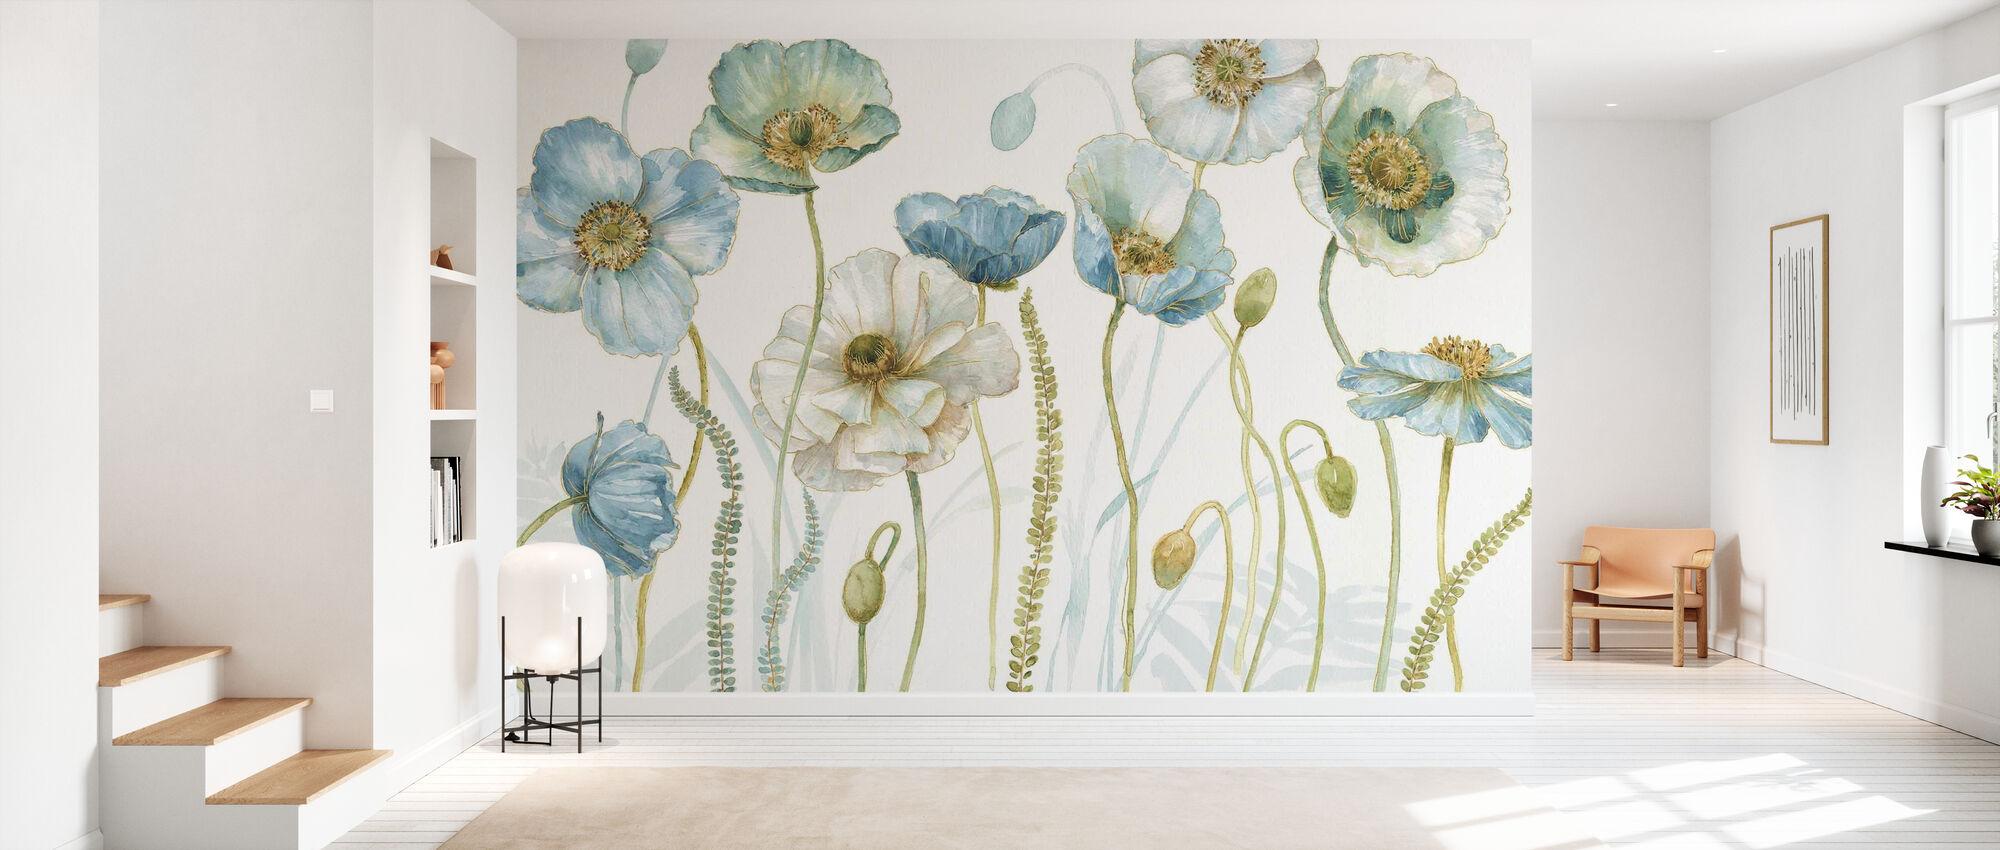 My Greenhouse Flowers 2 - Wallpaper - Hallway